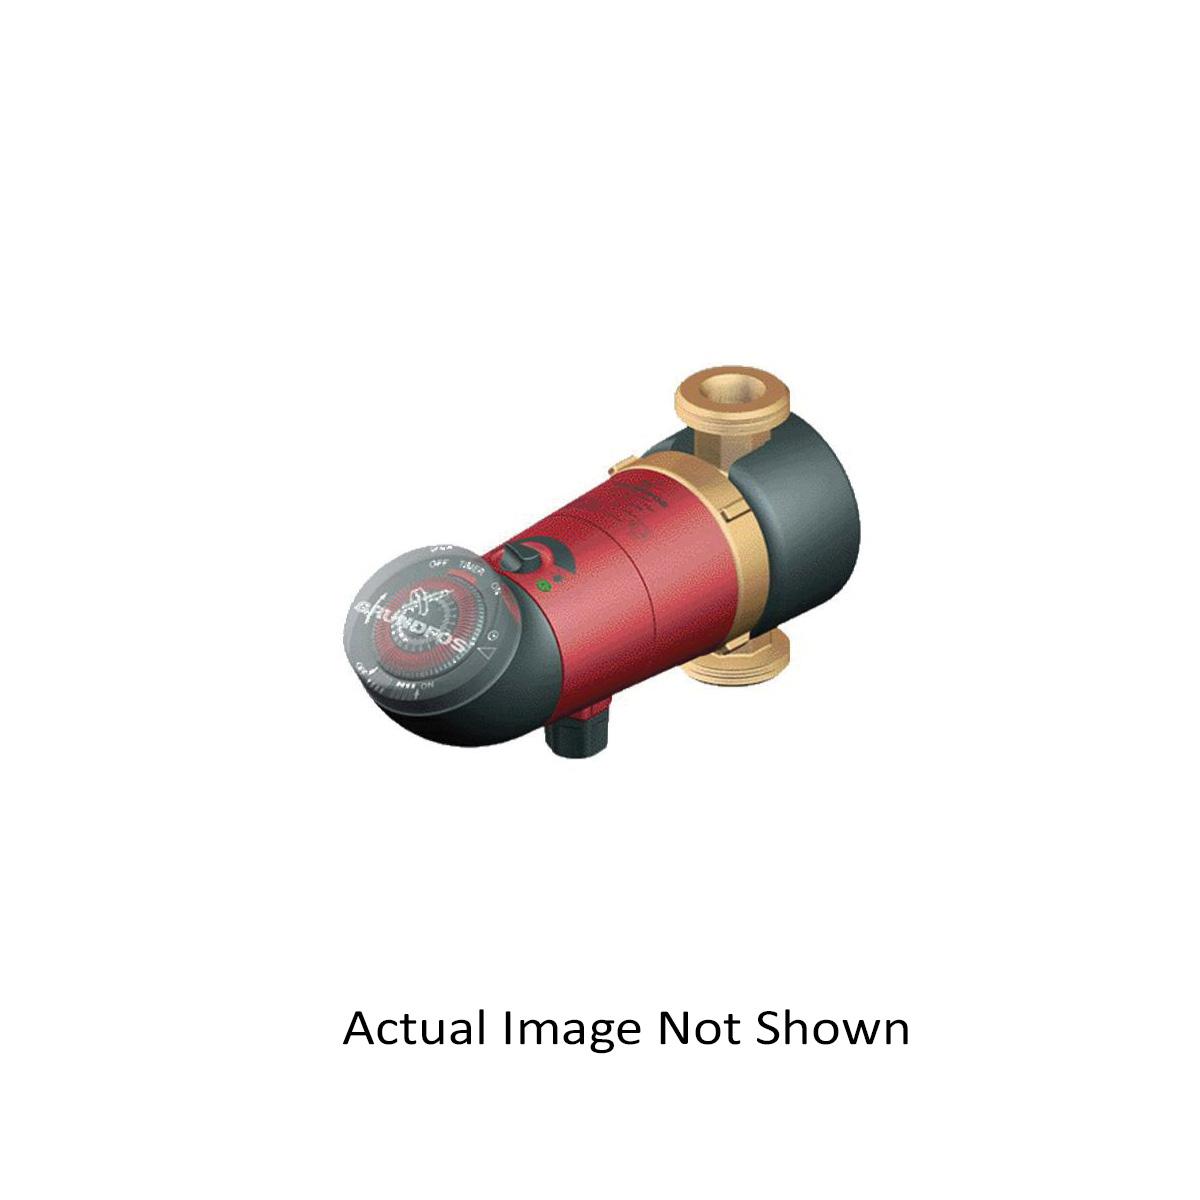 Grundfos UP10-16BUATLC 97525922 UP Series Circulator Pump, 0 to 3 gpm, 115 VAC